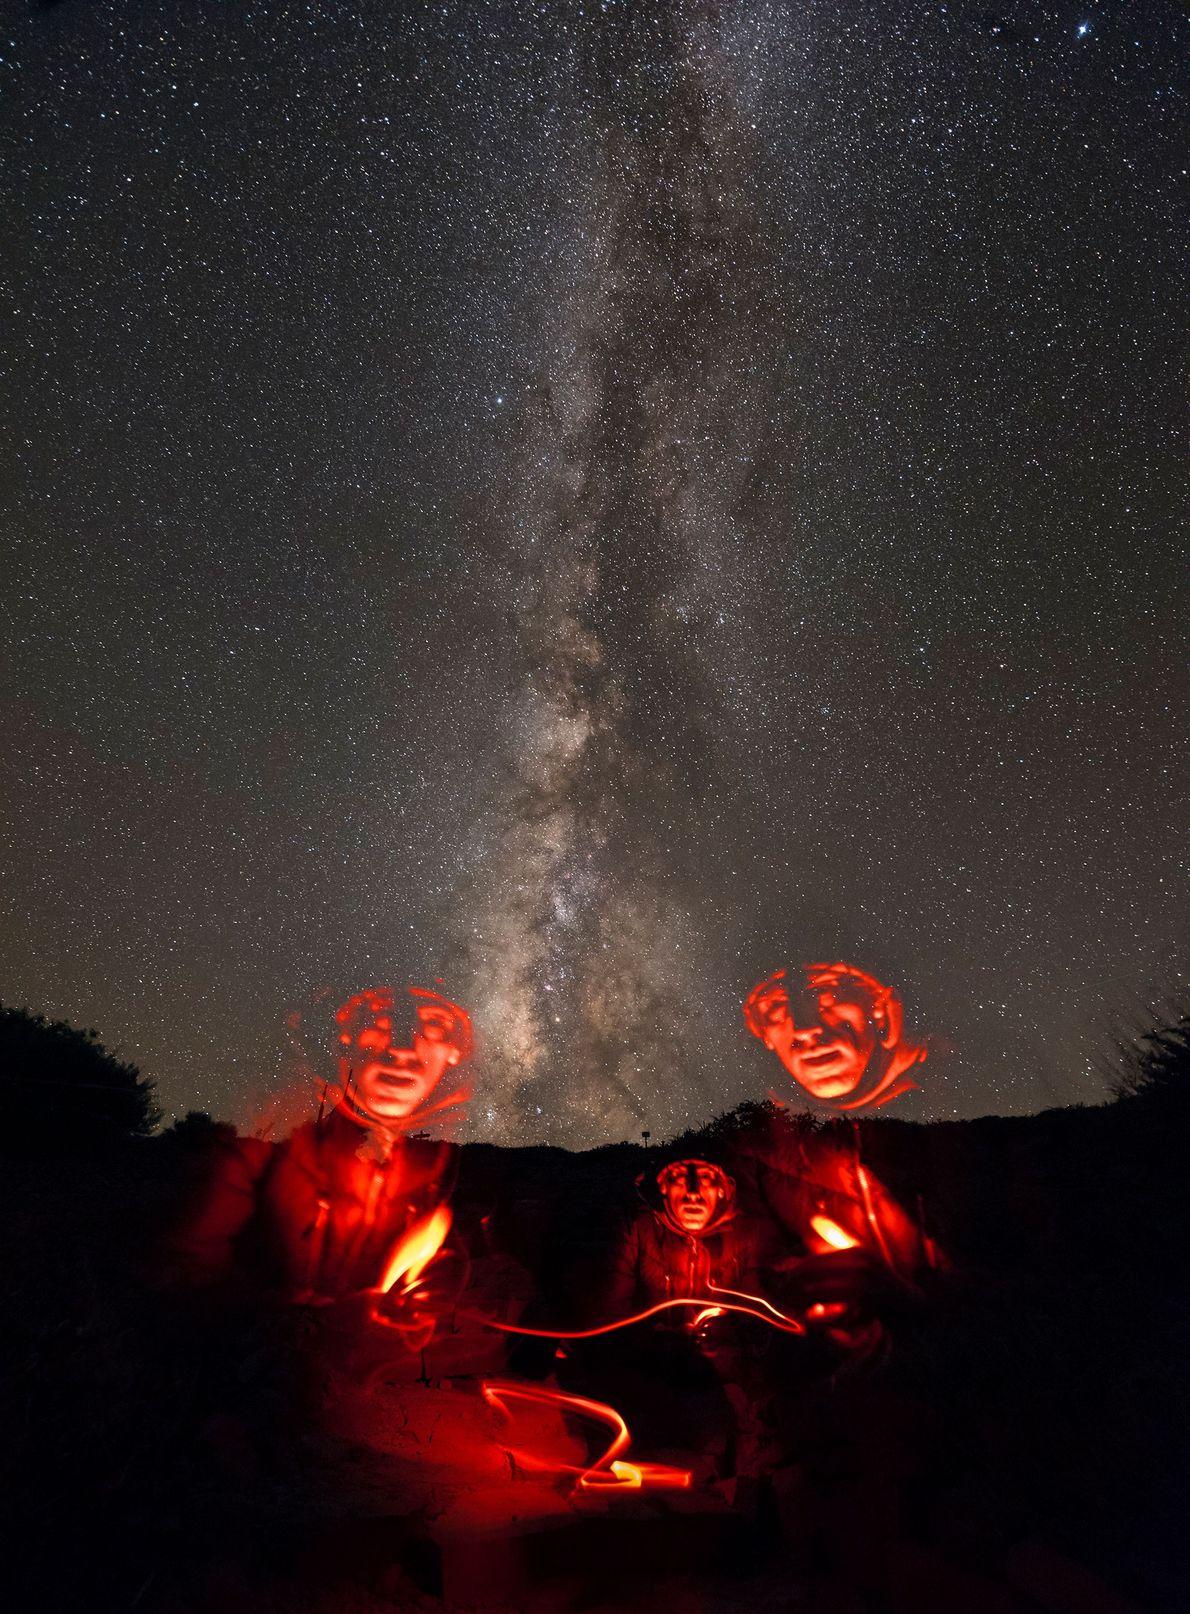 Autorretrato debaixo da via Láctea